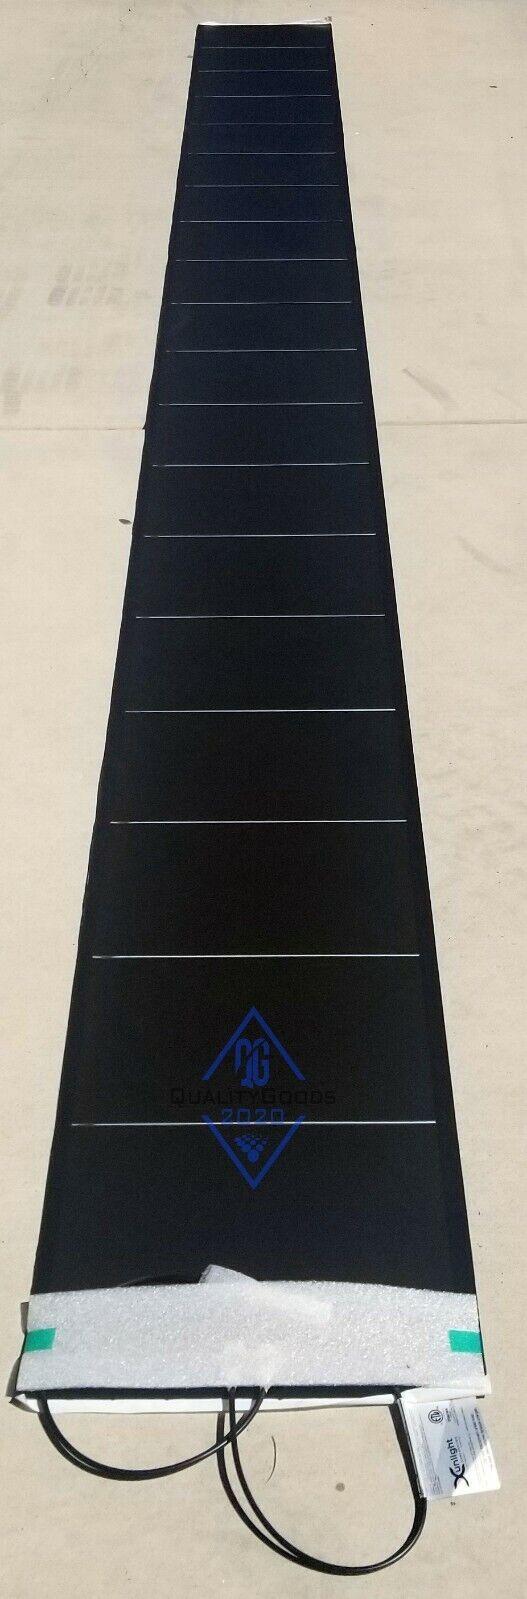 158 watt Xunlight Made in USA Flexible Solar panels new!  FI